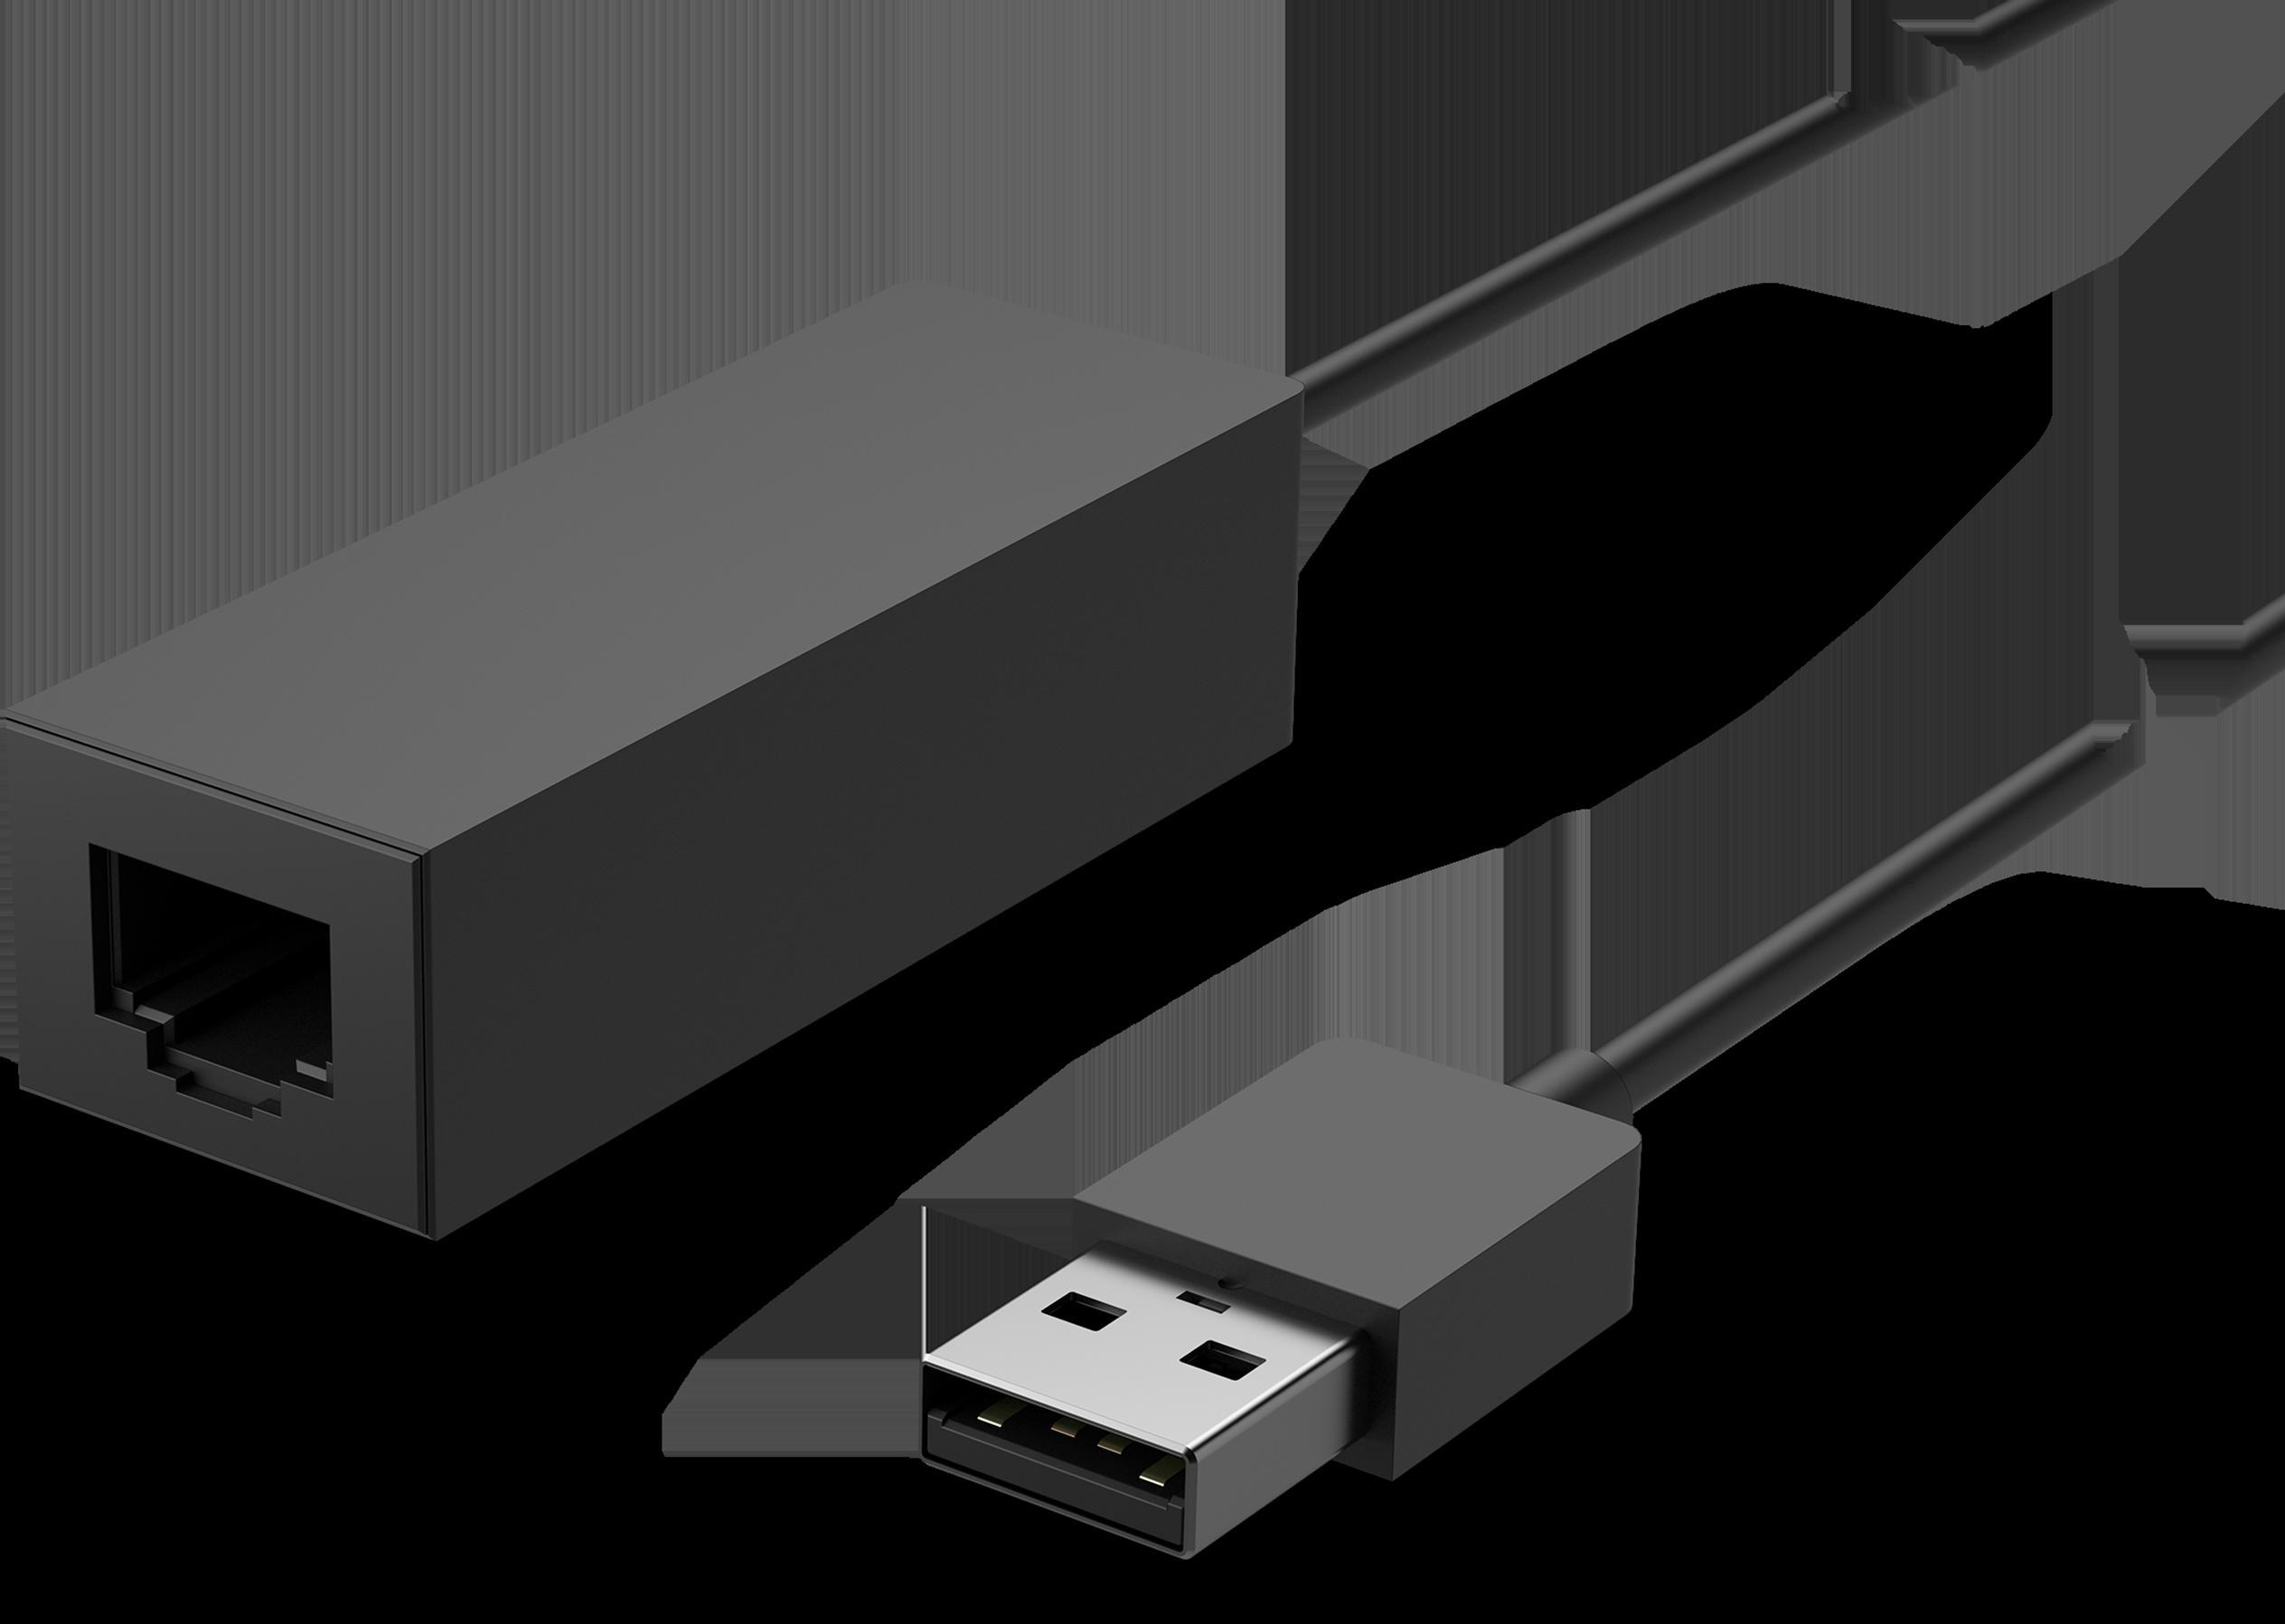 Microsoft Ethernet Adapter - USB 3.0 Gigabit